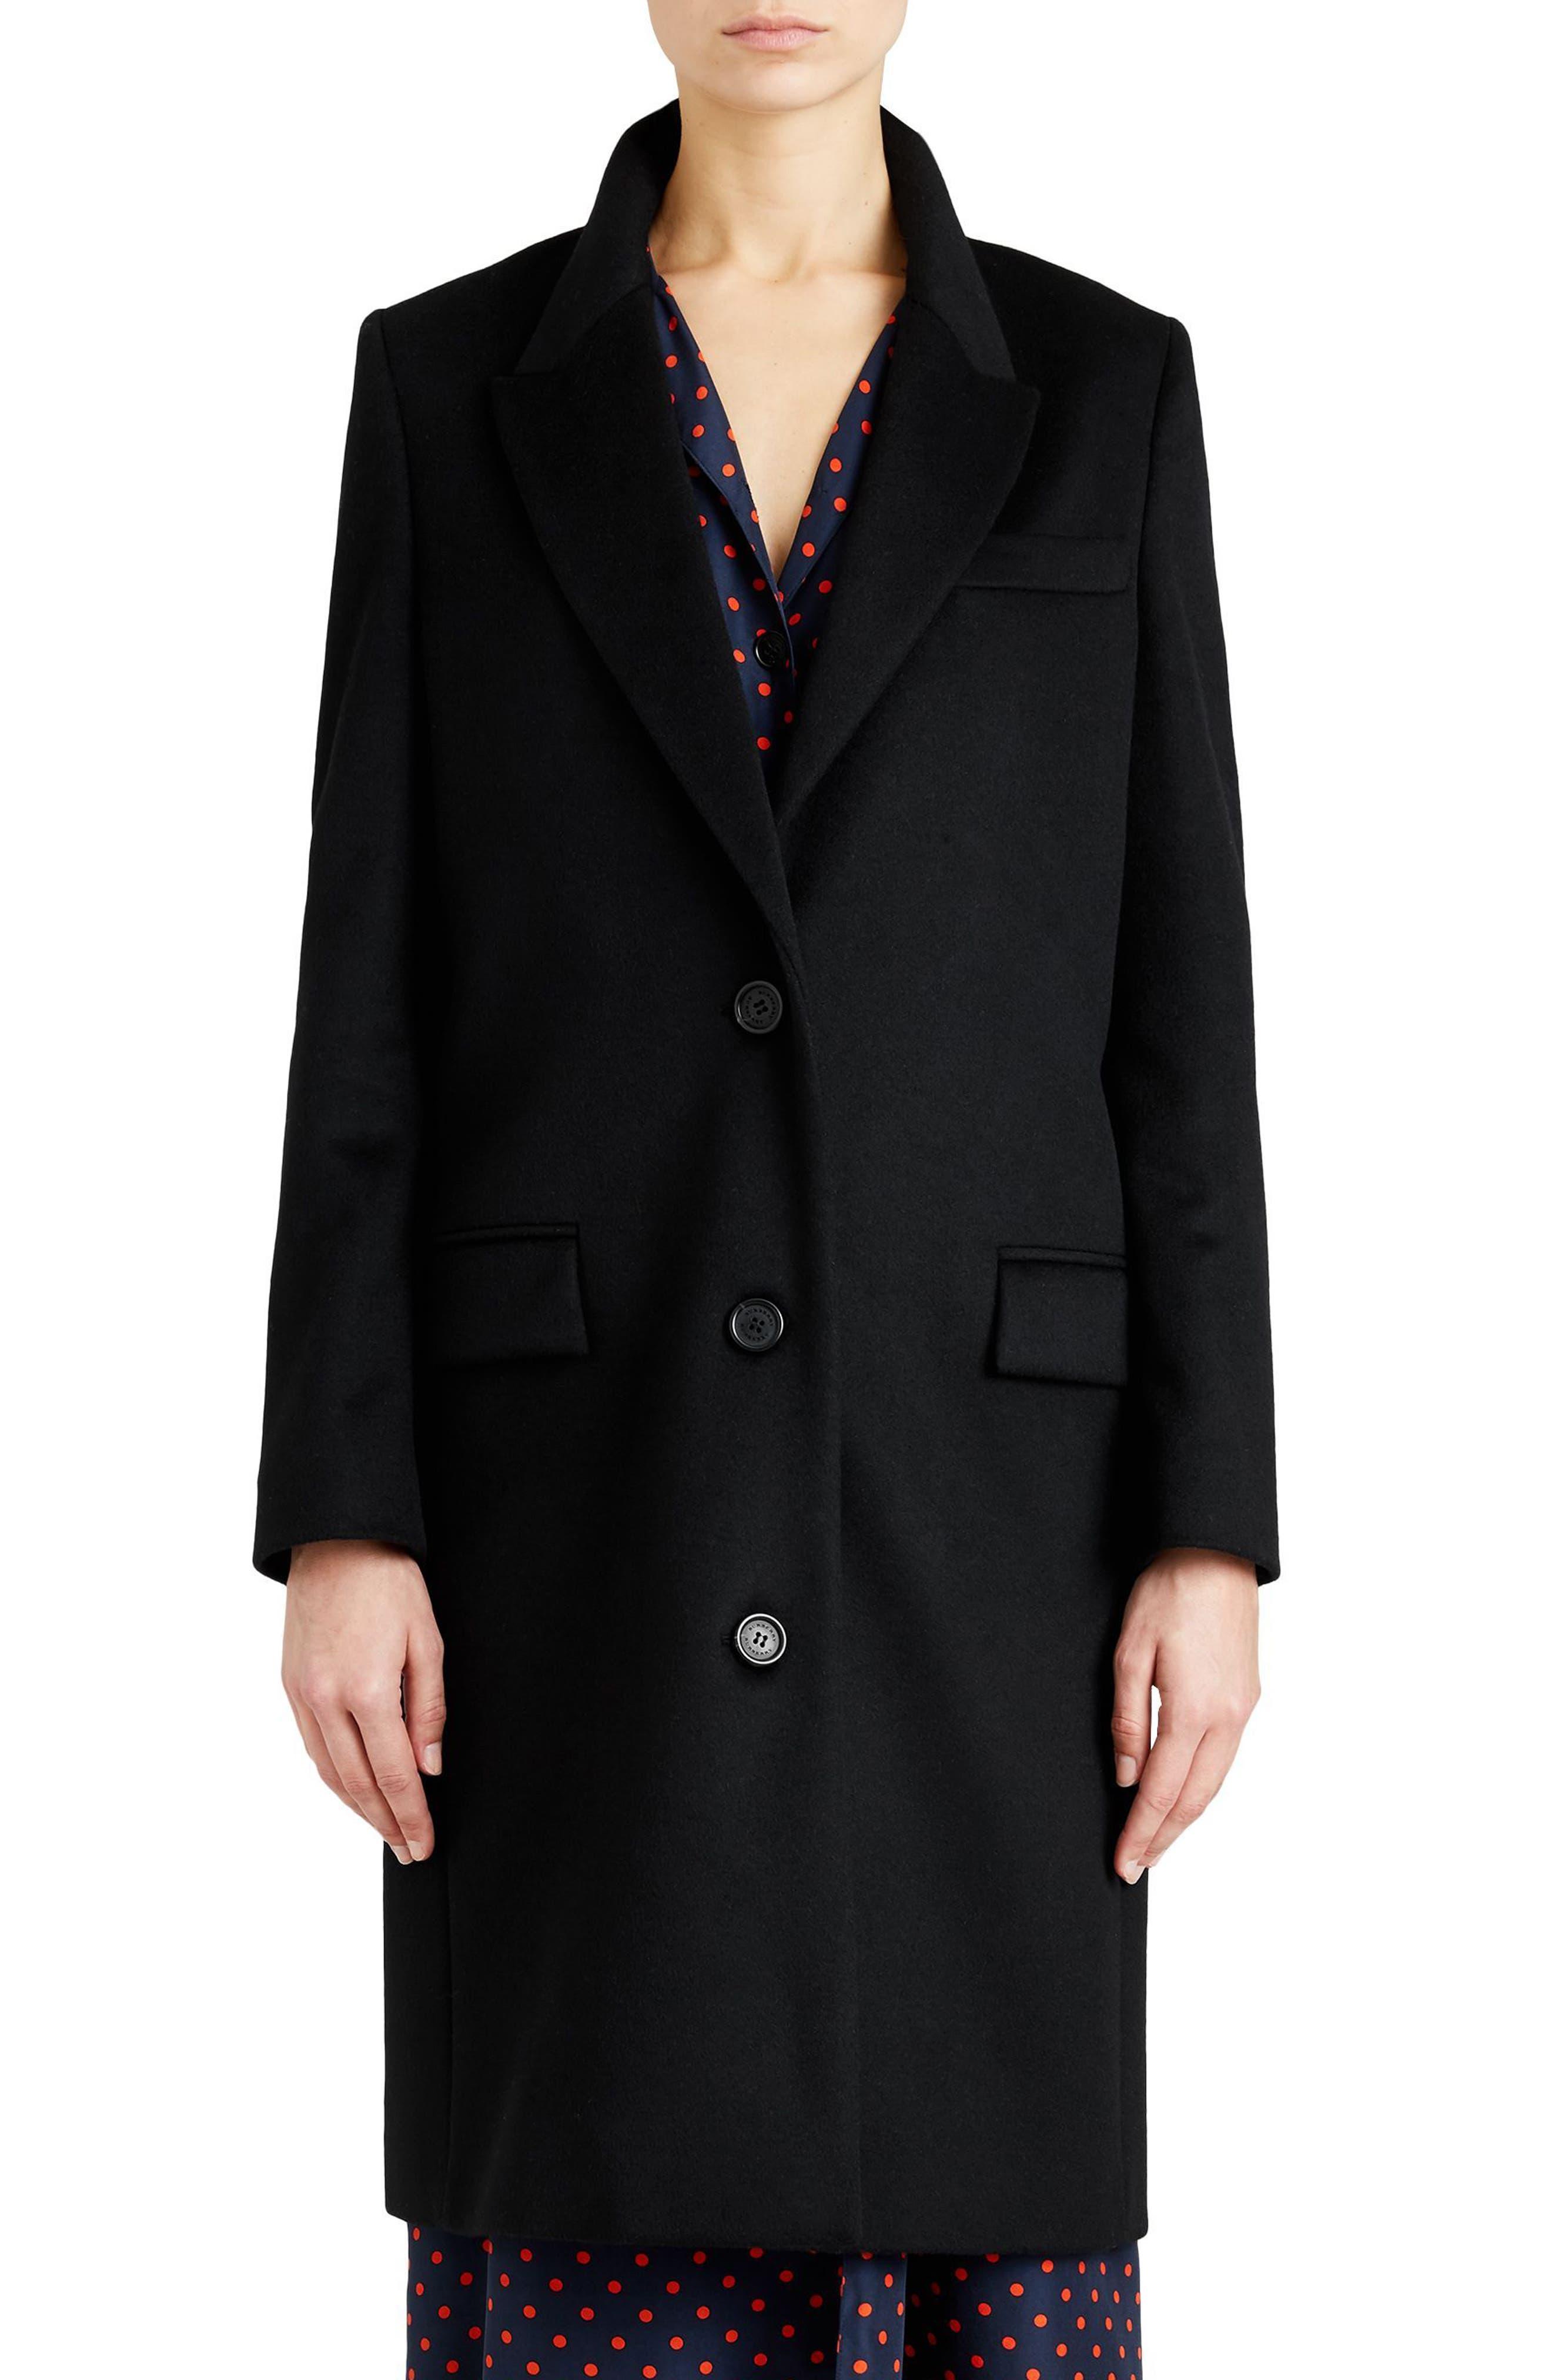 Fellhurst Wool & Cashmere Coat,                         Main,                         color, 001